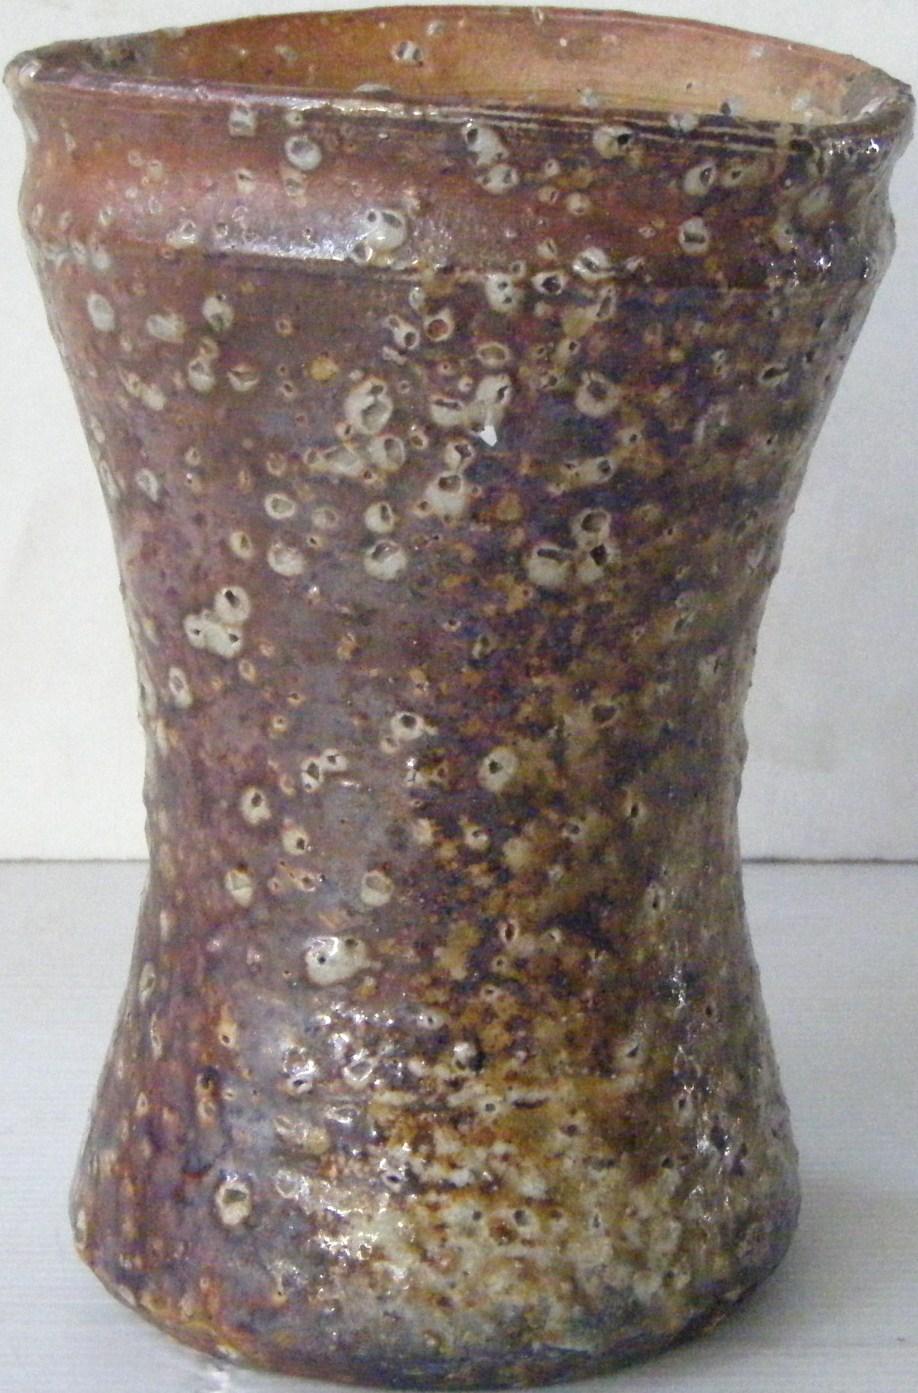 Les Blakebrough Sturt Pottery Decorative Arts The